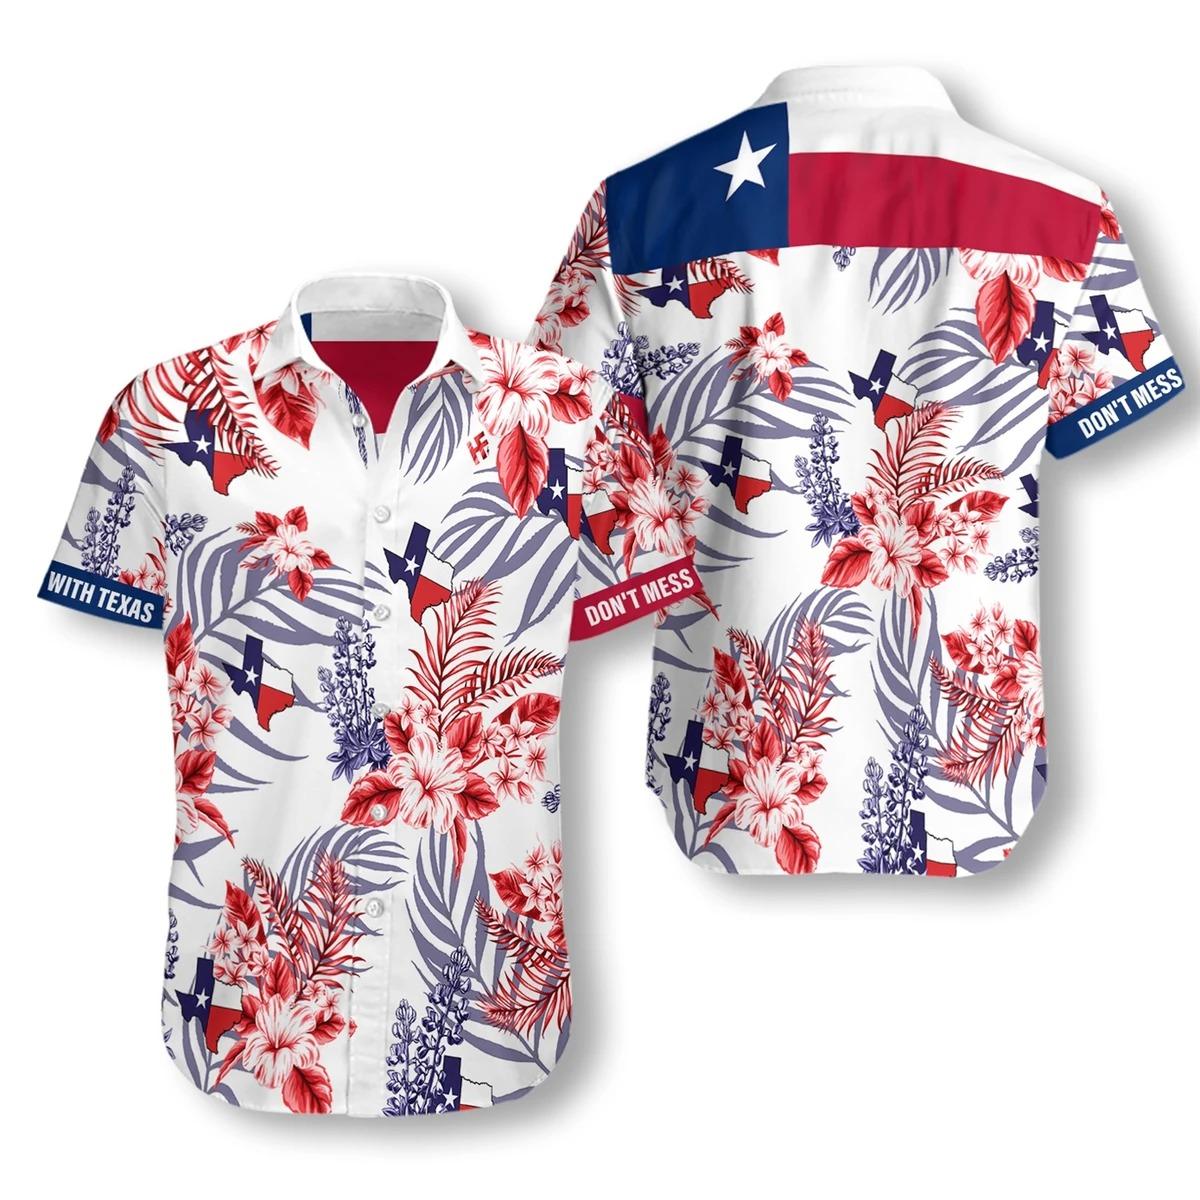 Dont mess with texas hawaiian shirt3